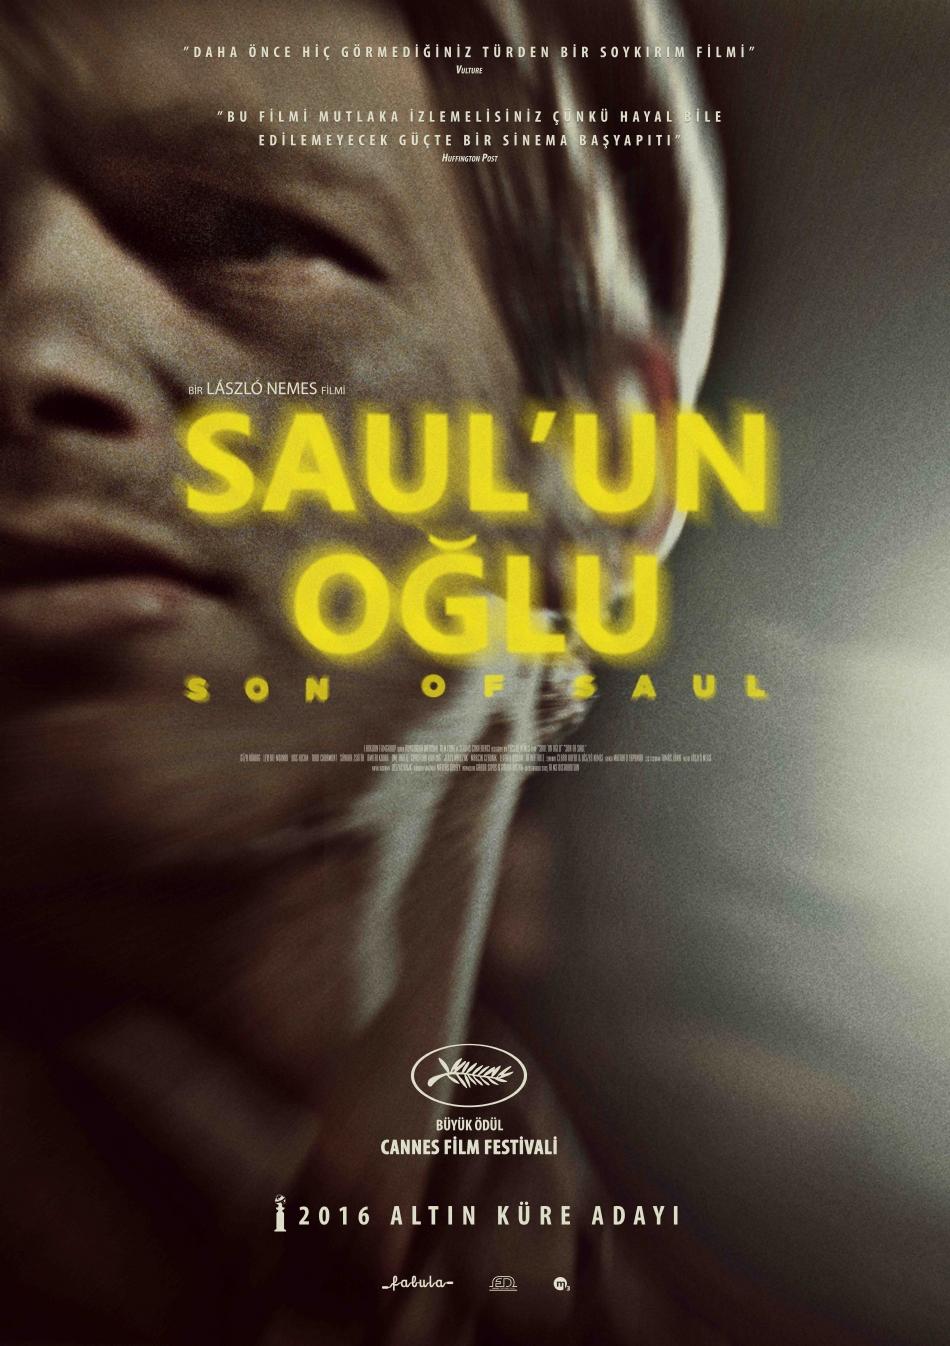 diktatör filmi izle türkçe dublaj 1080p